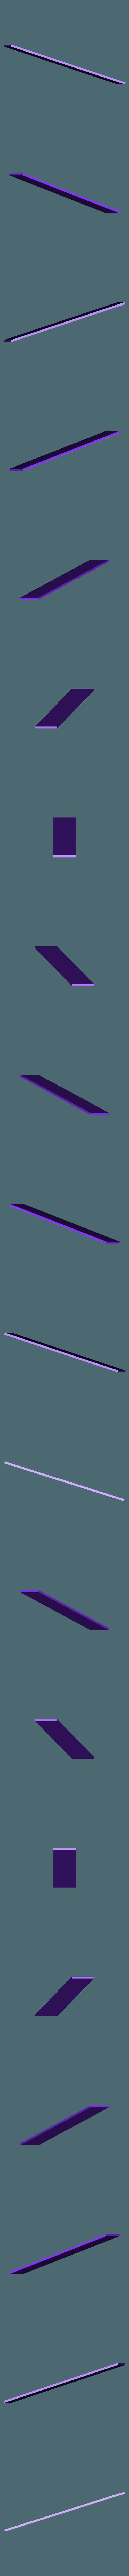 4.stl Download free STL file Deagostini Millennium Falcon Engine Exhaust SOLO version • 3D print object, boryelwoc